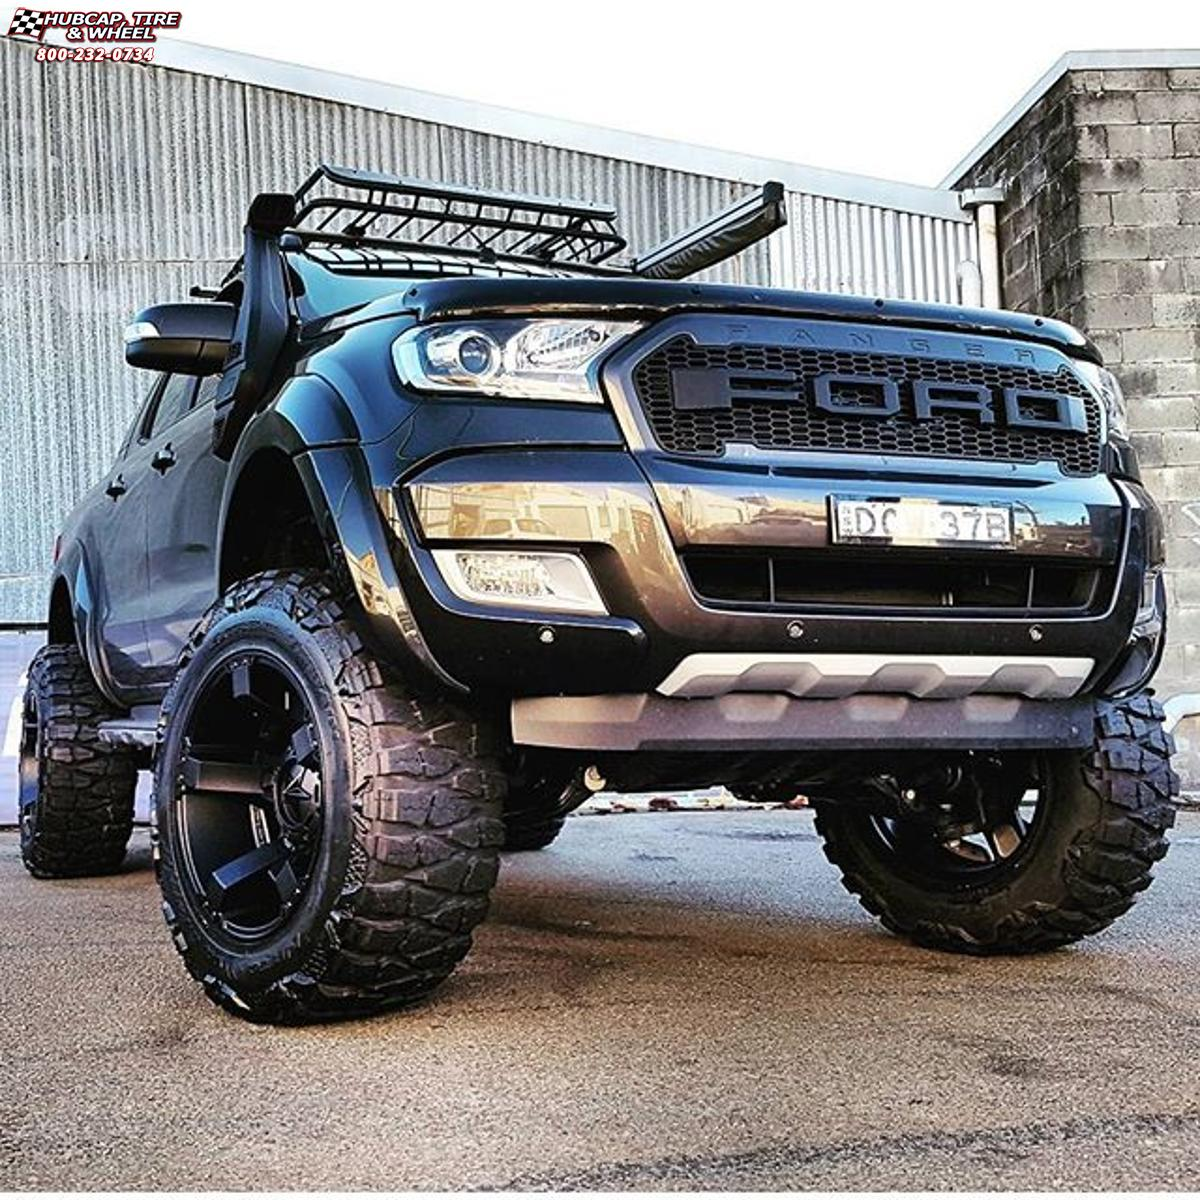 Ford Ranger 4x4 2000 >> Ford Ranger Wildtrak XD Series XD811 Rockstar 2 Wheels Satin Black and Black Inserts